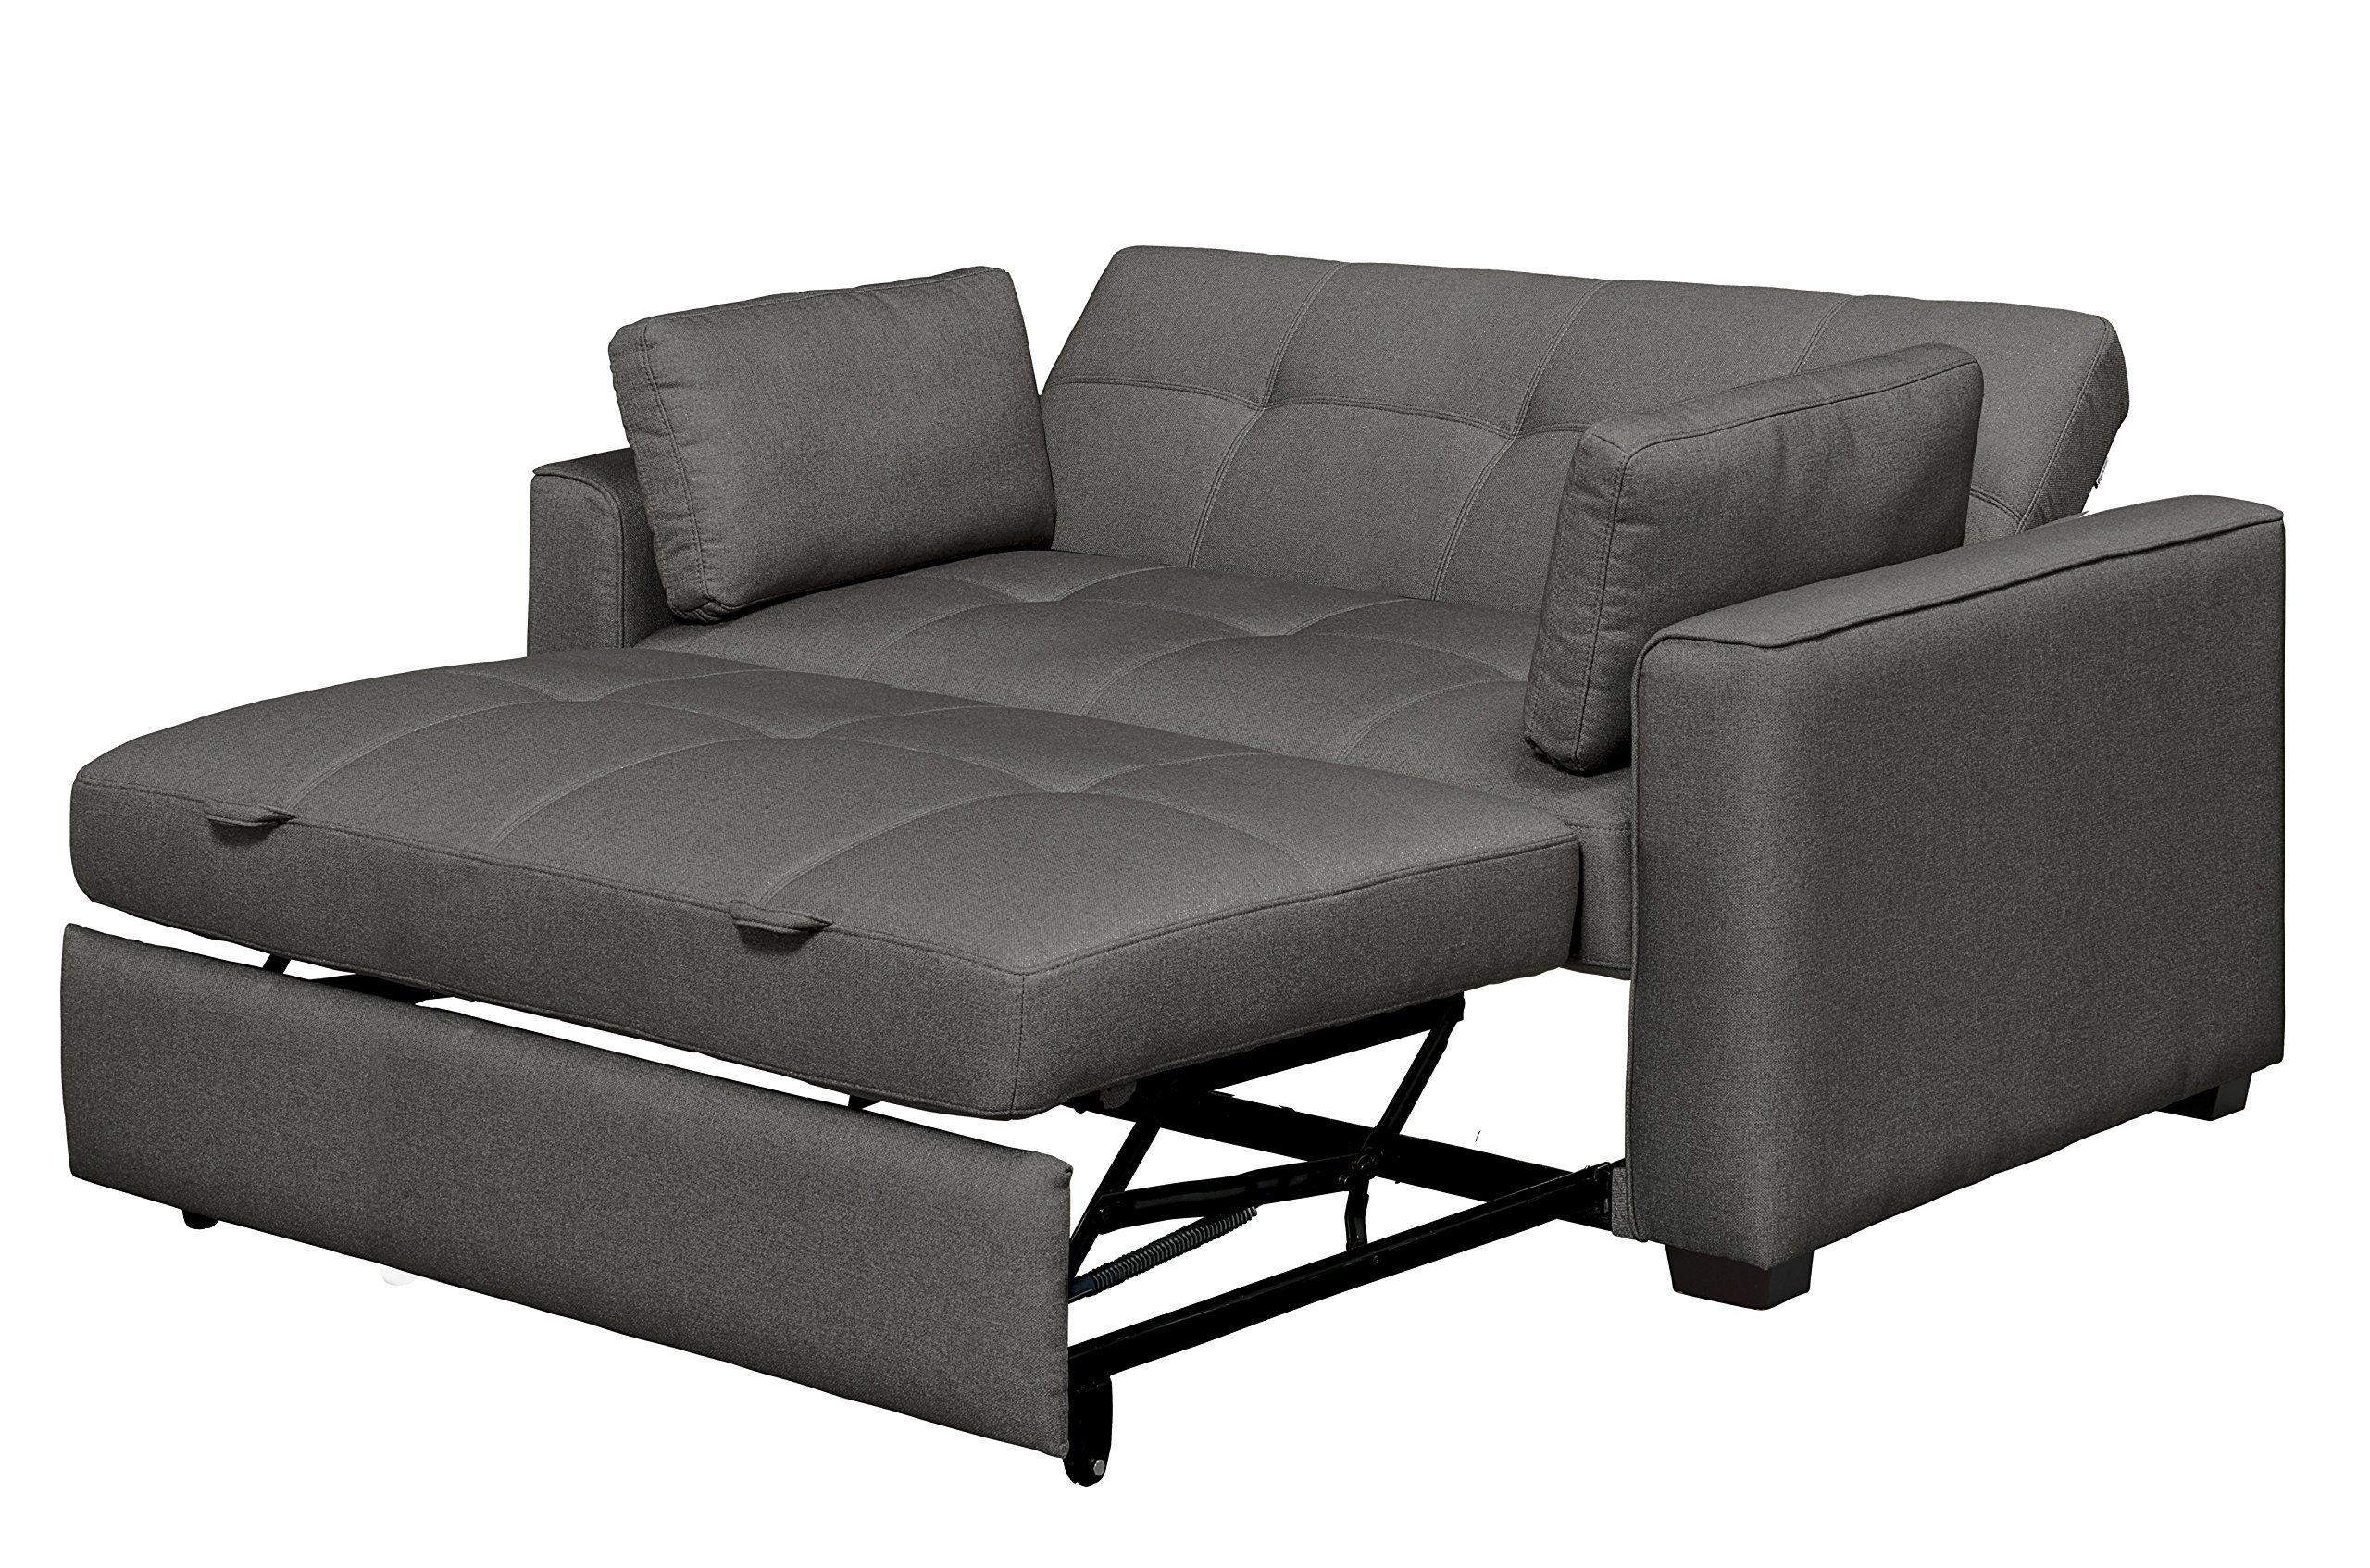 Mechali Products Furniture Serta Sofa Sleeper Convertible Into